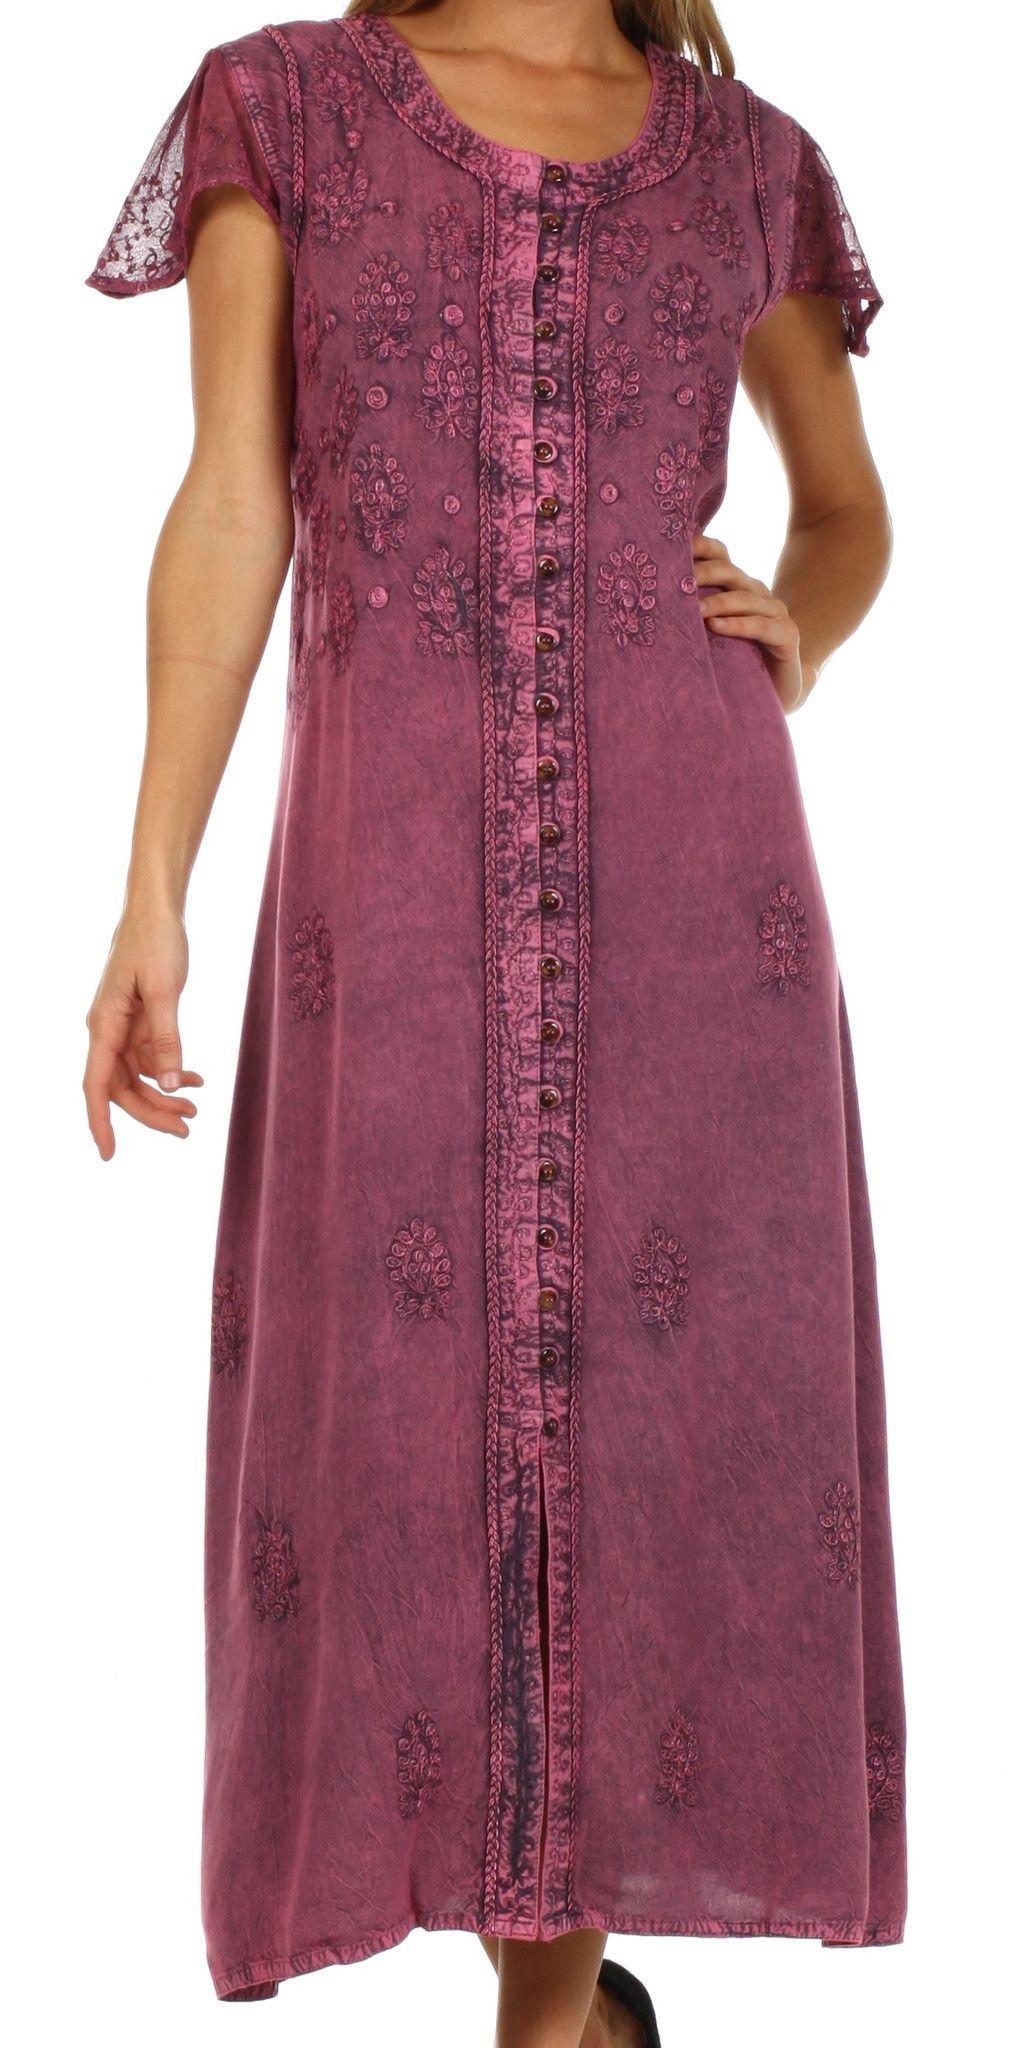 Sakkas stonewashed embroidered cap sleeve maxi long dress final